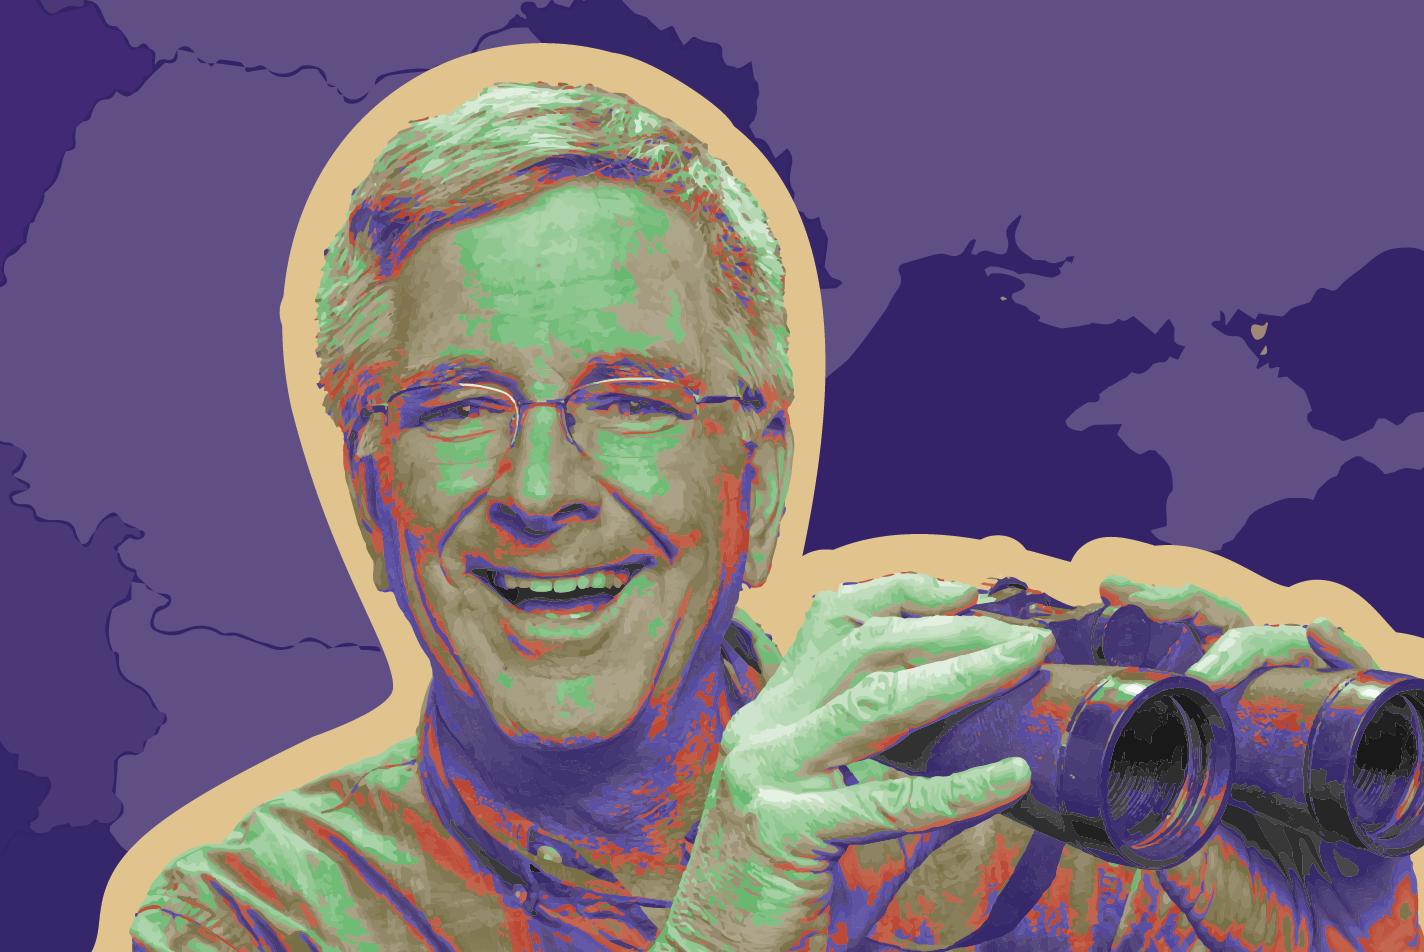 Edited photo of Rick Steves with binoculars